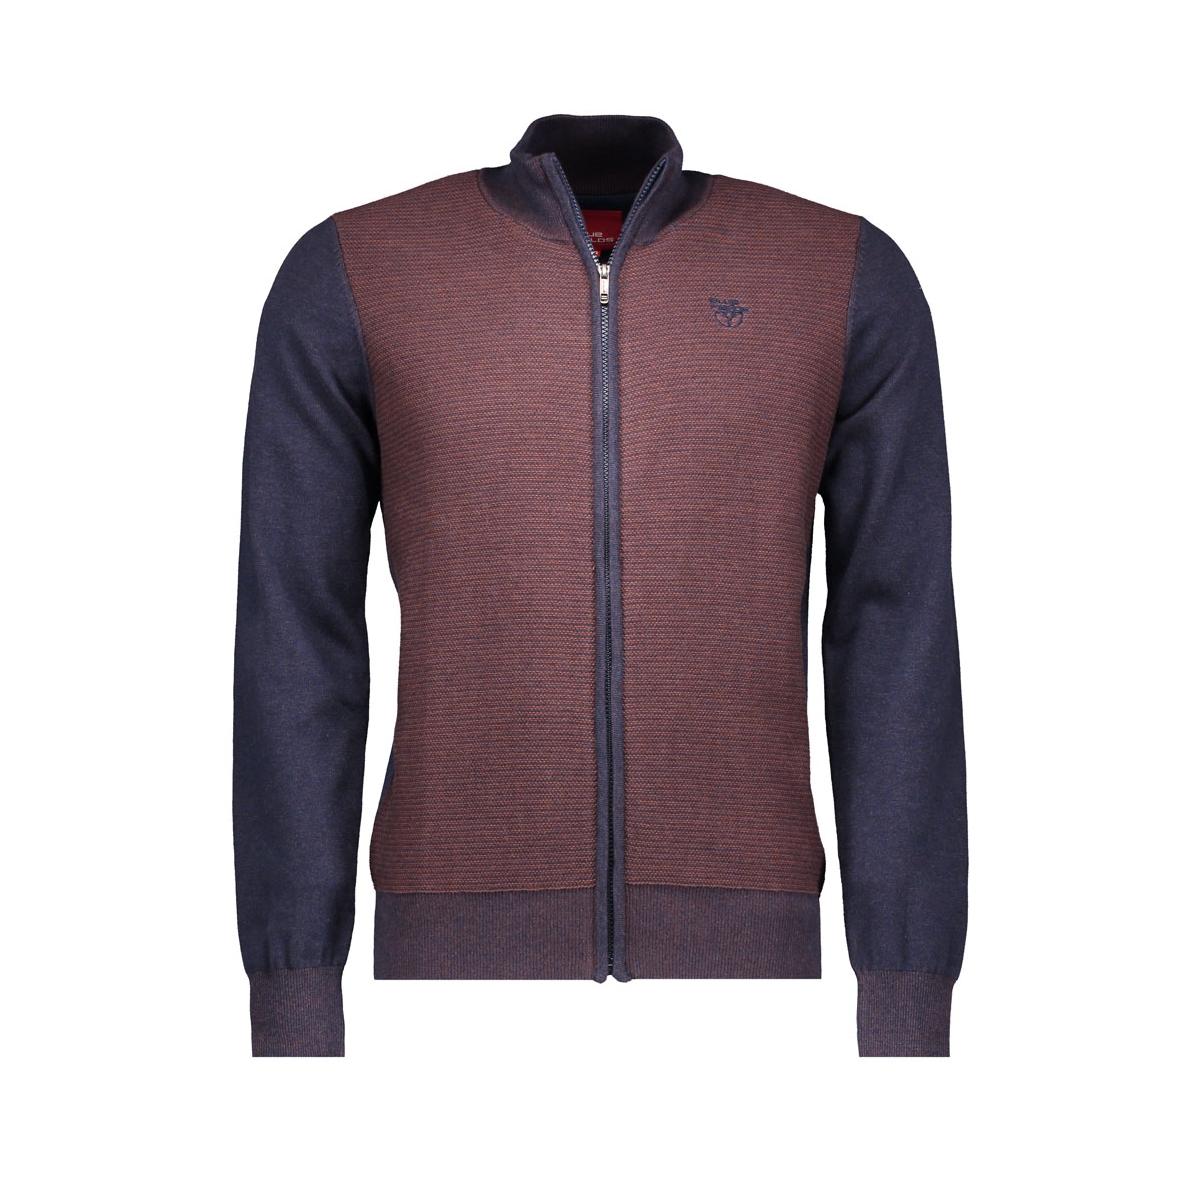 16435011 bluefields vest 5884